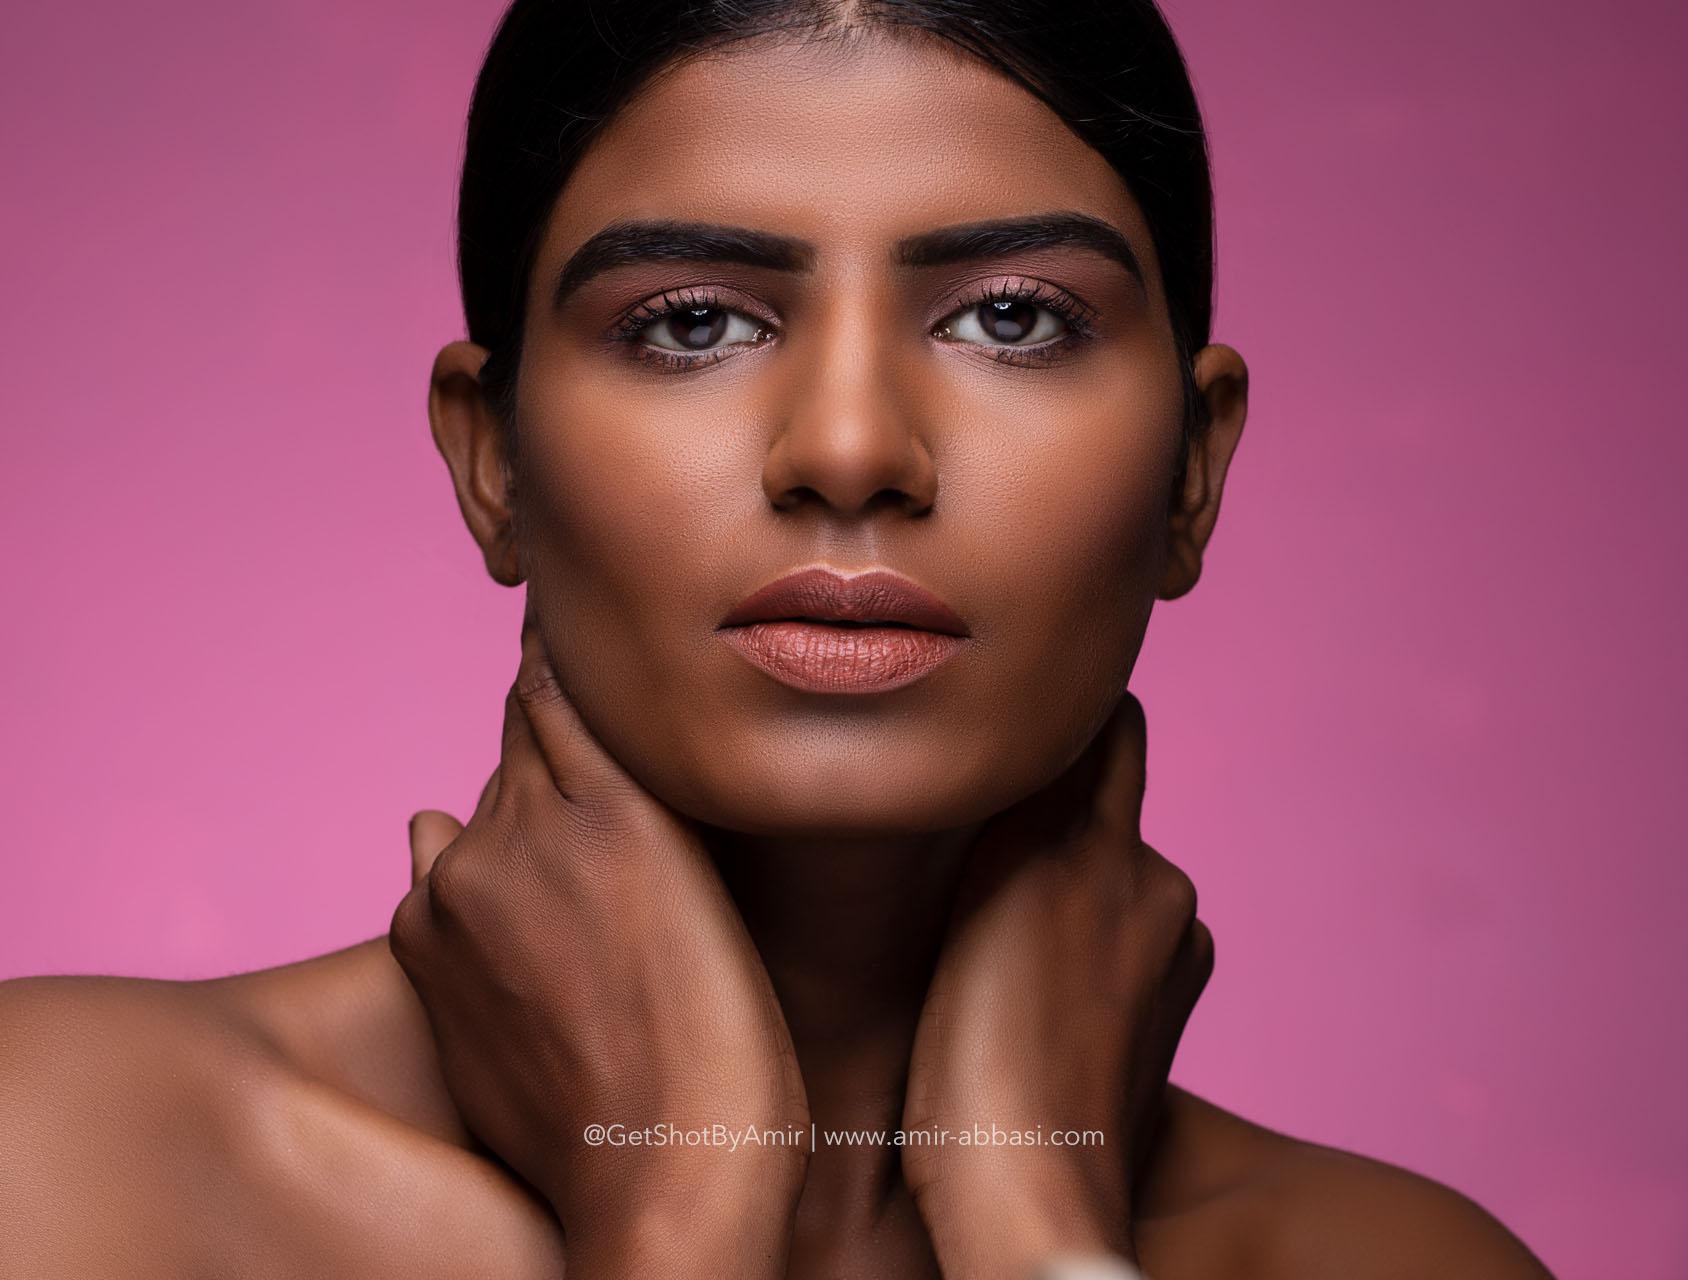 Awesome dark beauty shots by Amir Abbasi